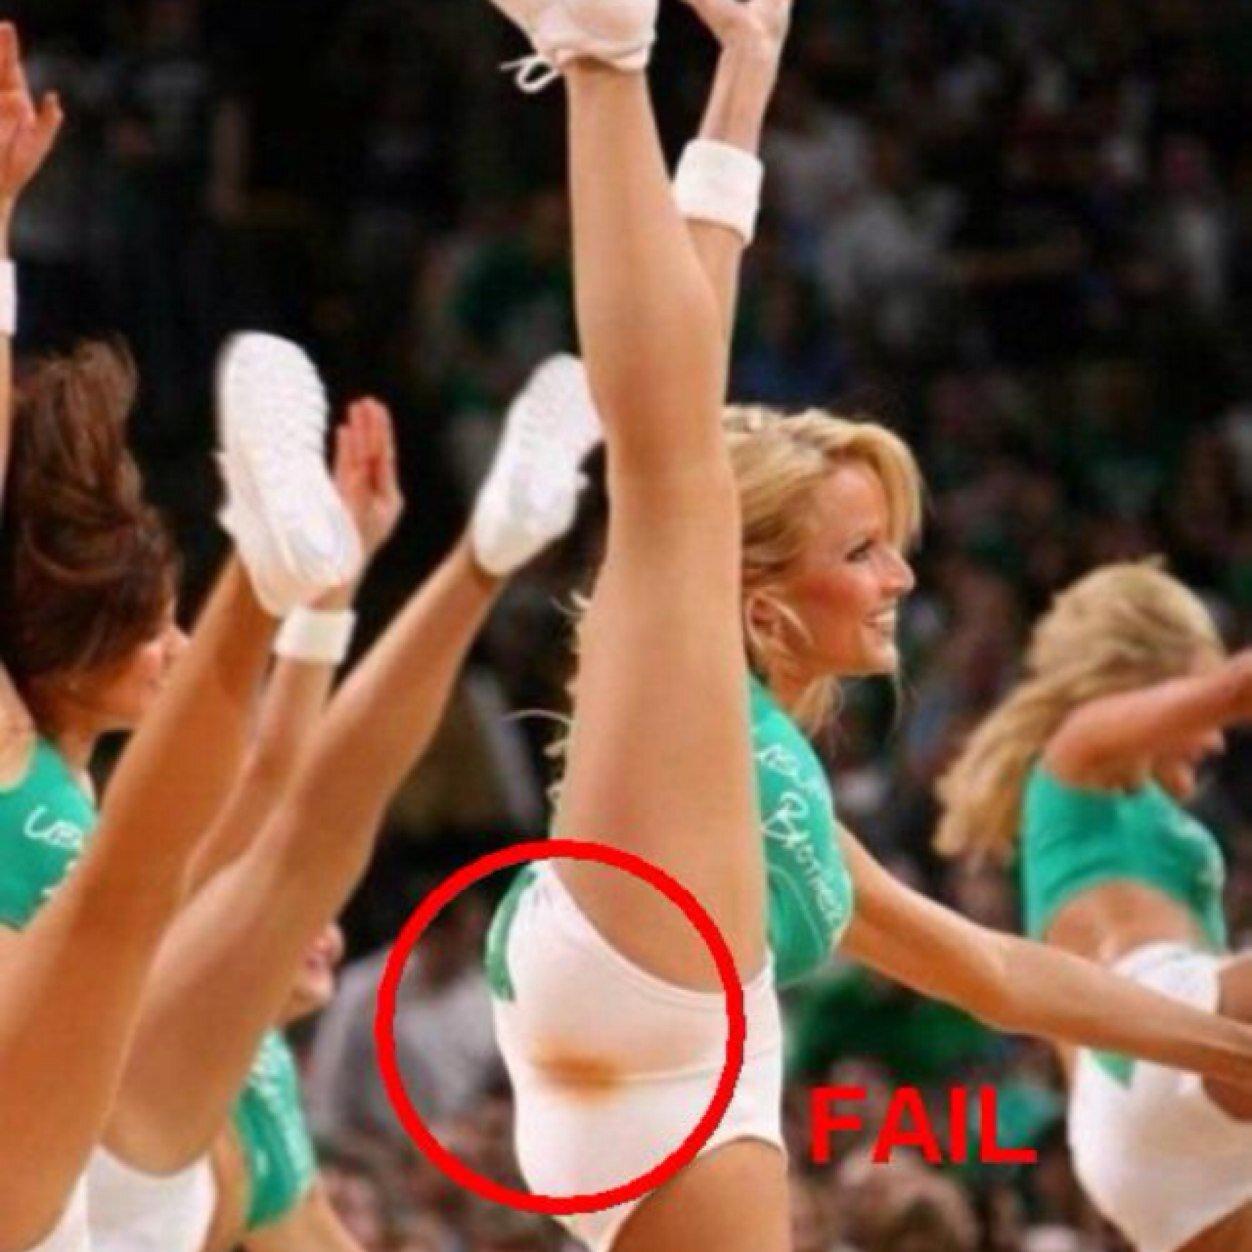 Nfl Cheerleader Wardrobe Malfunction  Hot Girl Hd Wallpaper-3856